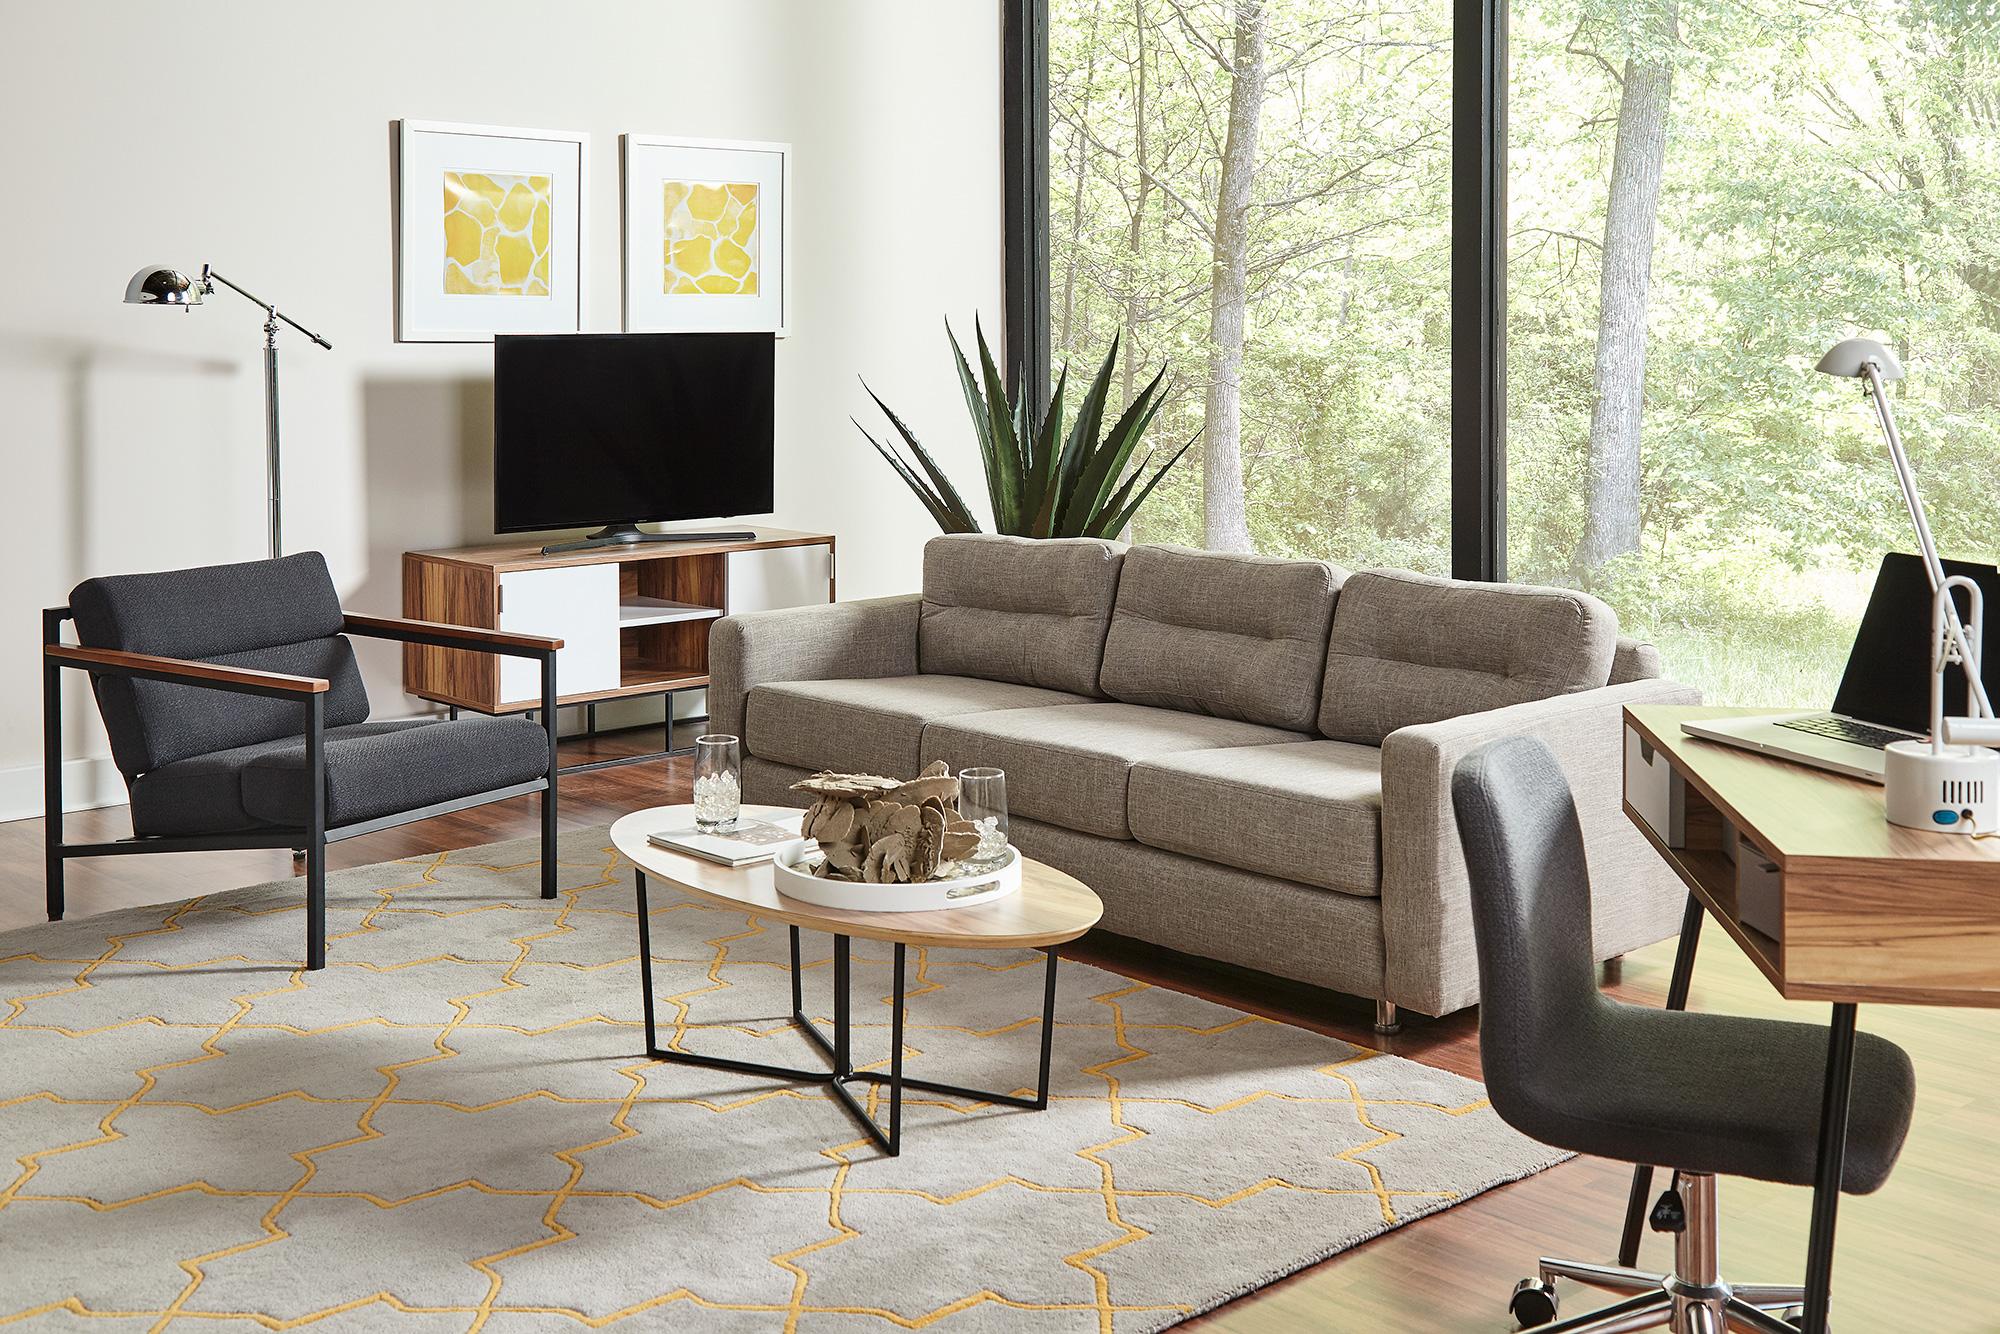 F3 Dmitri living room student housing furniture